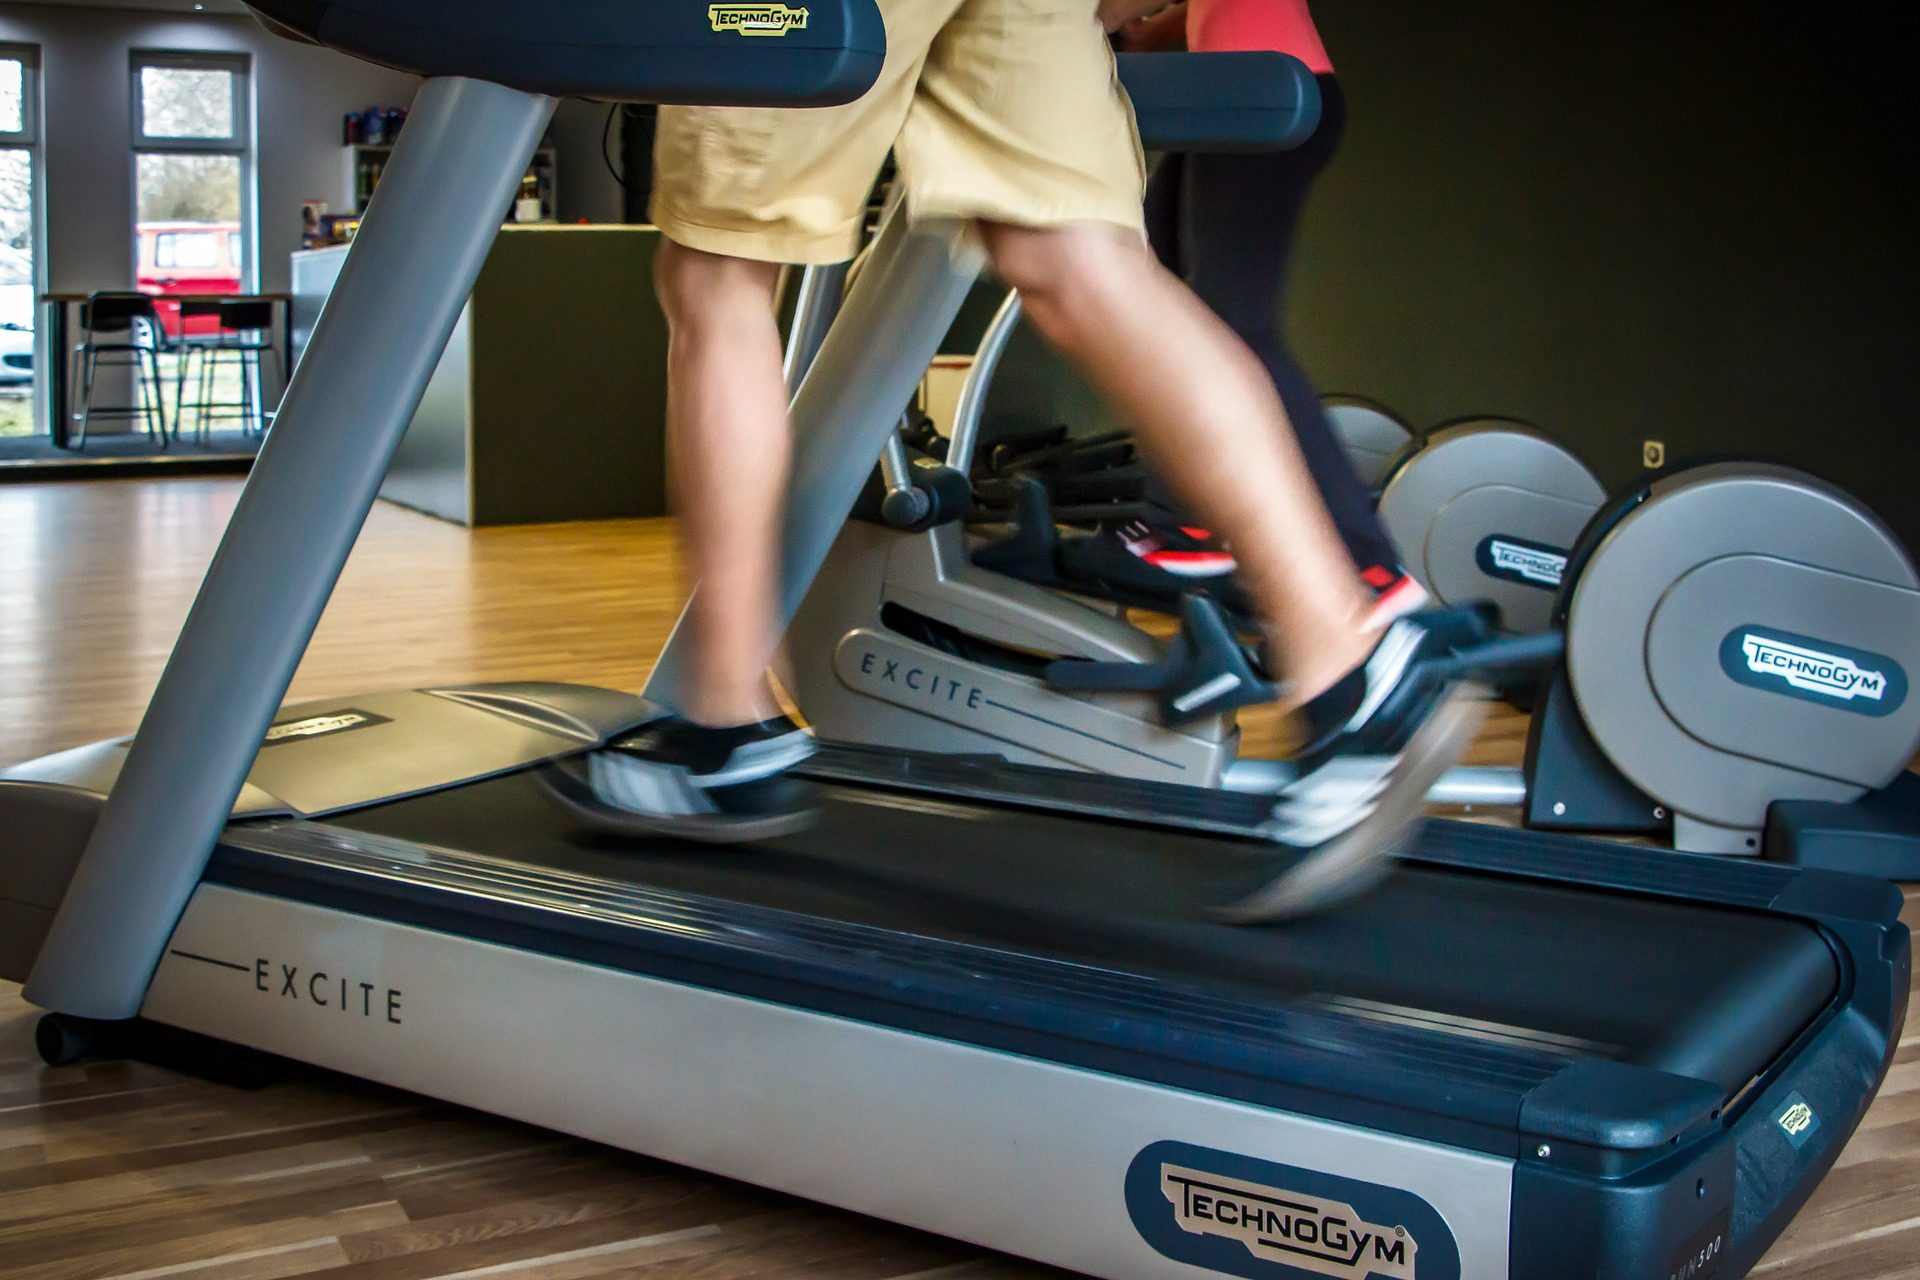 gimnasio, cinta, running, ejercicio, carrera - Fondos de Pantalla HD - professor-falken.com